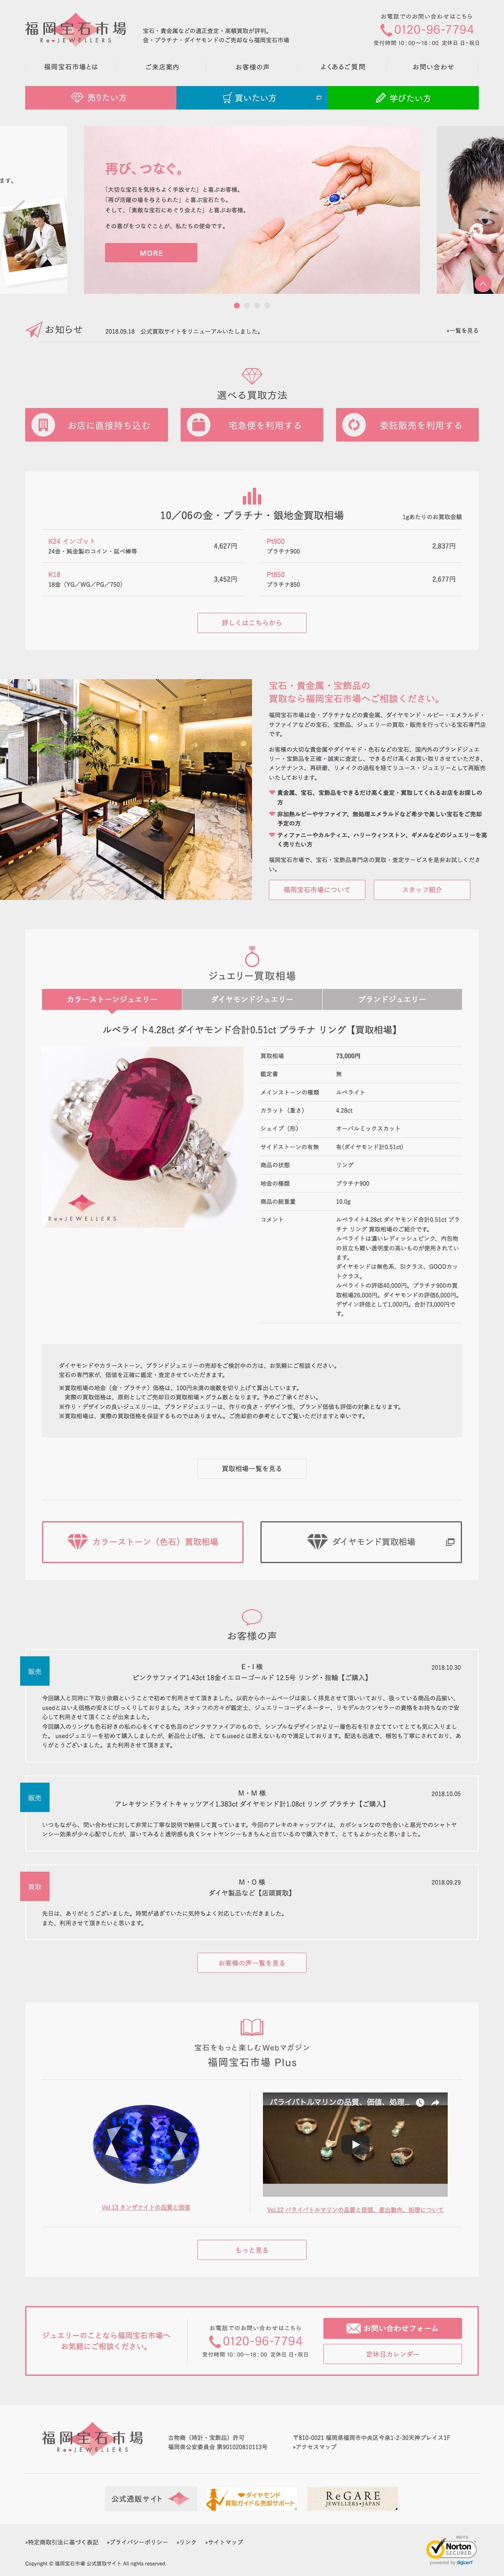 [写真]WEB 福岡宝石市場 買取サイト 1